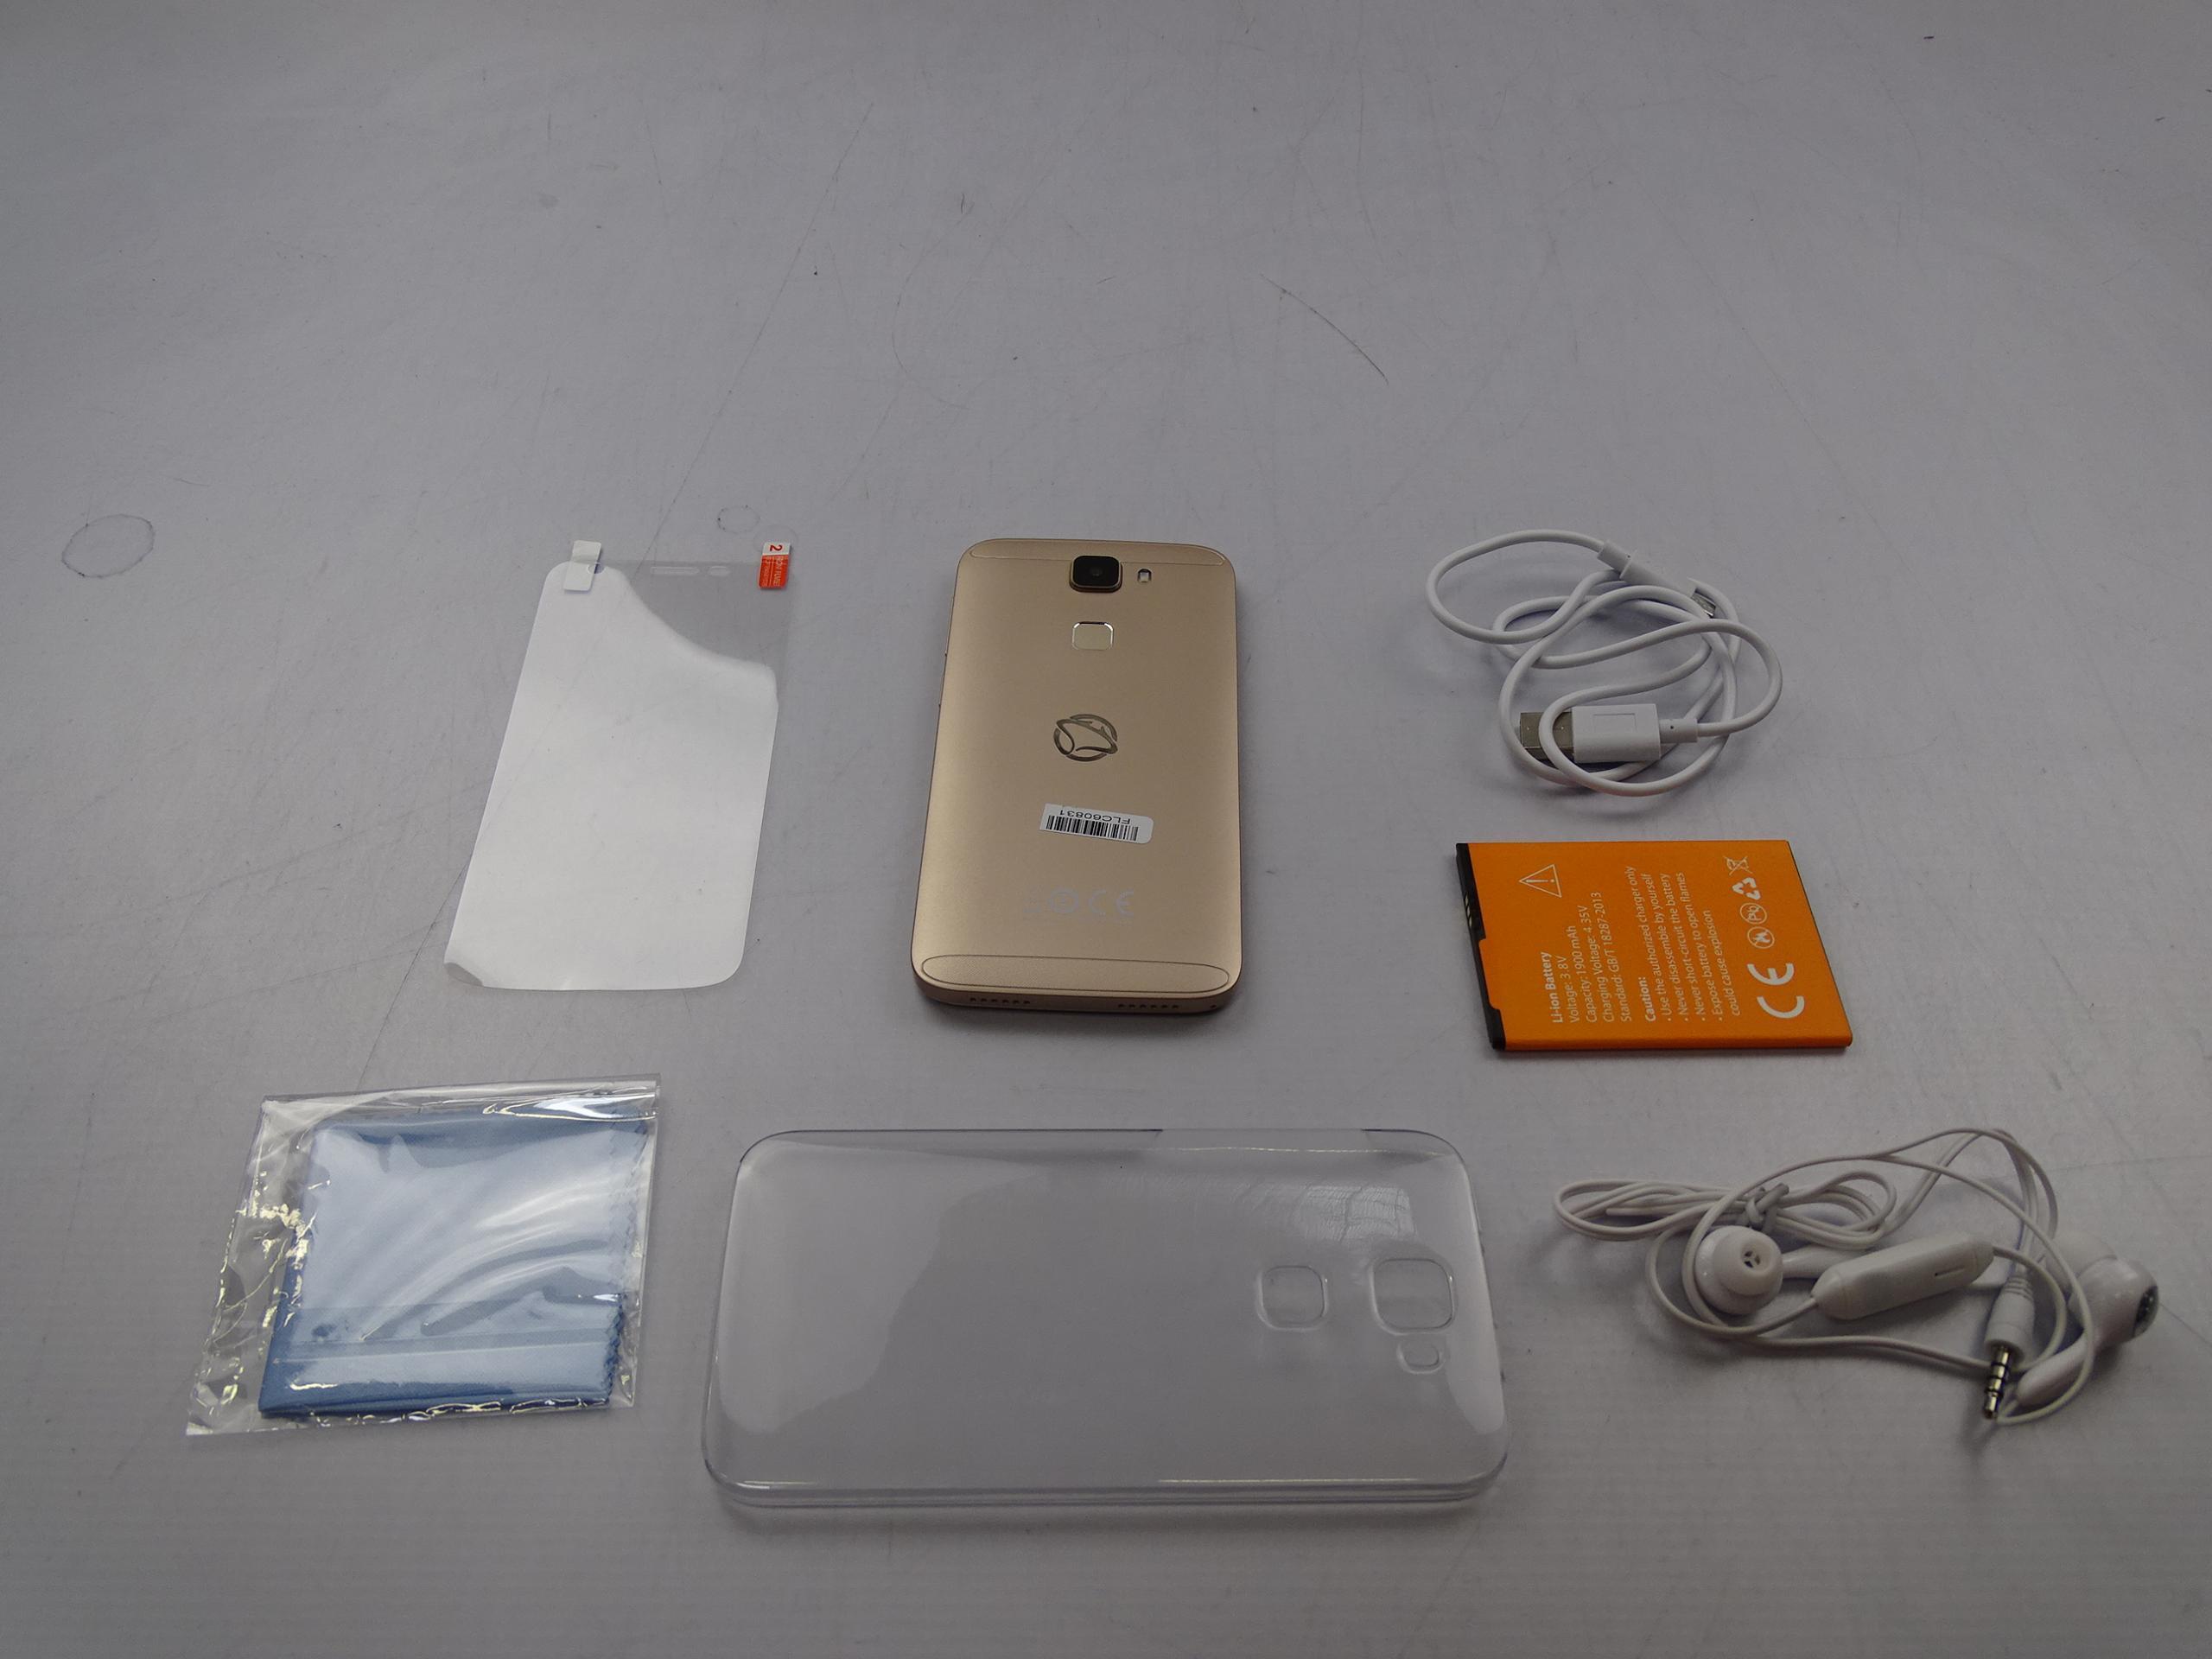 Outlet Oleole Smartfon Manta Msp95012 Titano 1 7314074036 Short Circuit